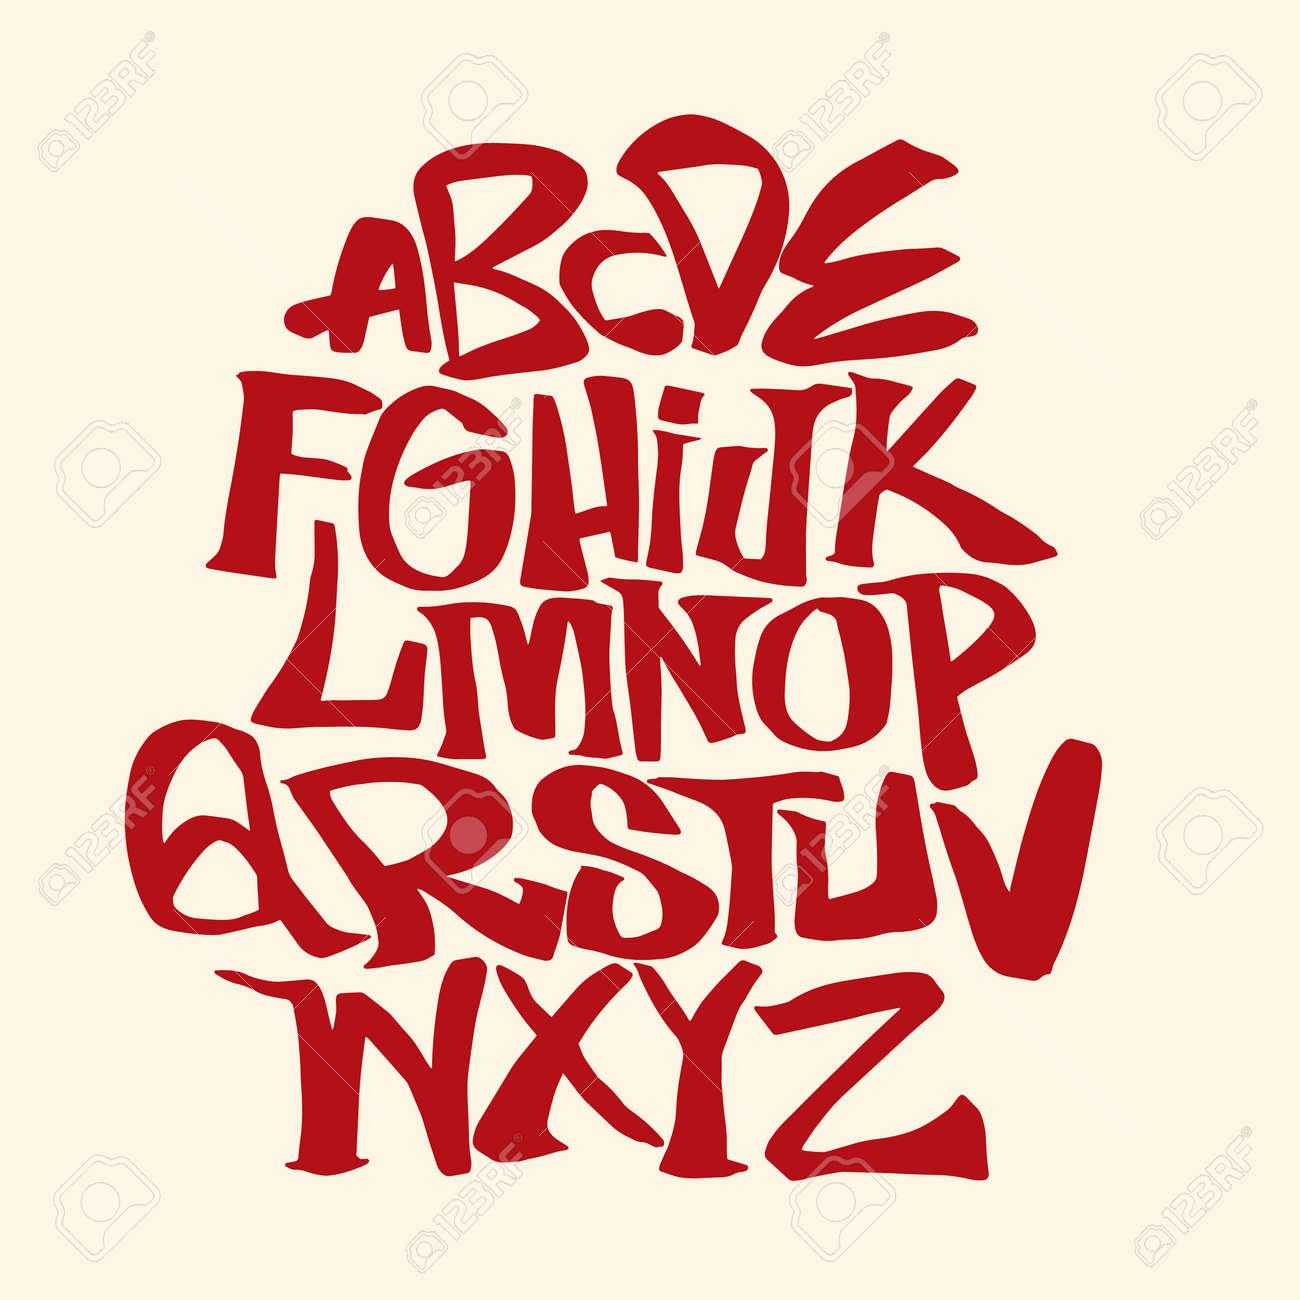 Hand lettering sketch font vector alphabet royalty free cliparts hand lettering sketch font vector alphabet stock vector 91361884 altavistaventures Choice Image